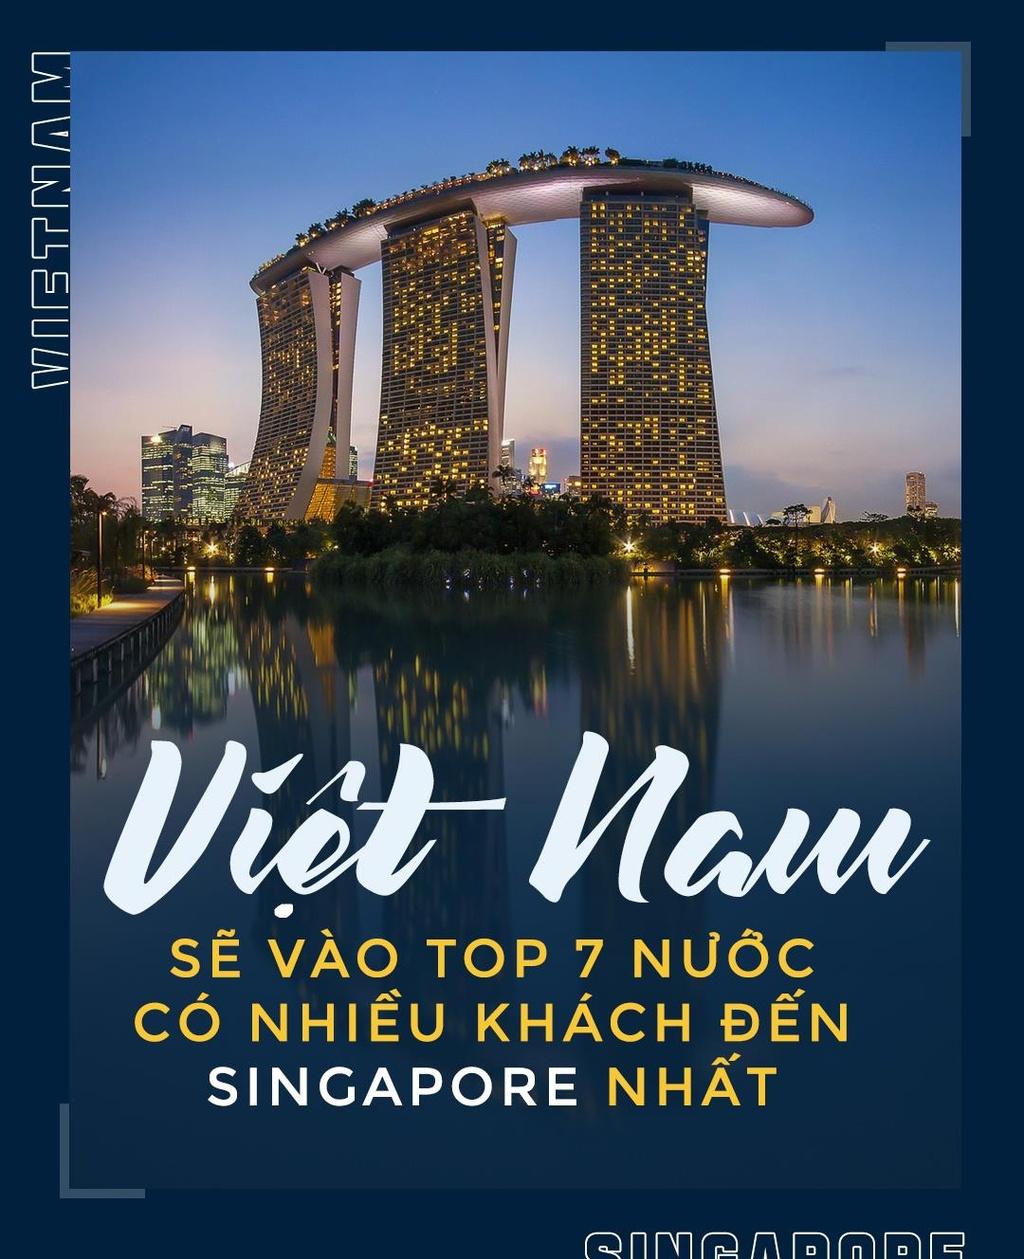 'Viet Nam se vao top 7 nuoc co nhieu khach den Singapore nhat' hinh anh 1